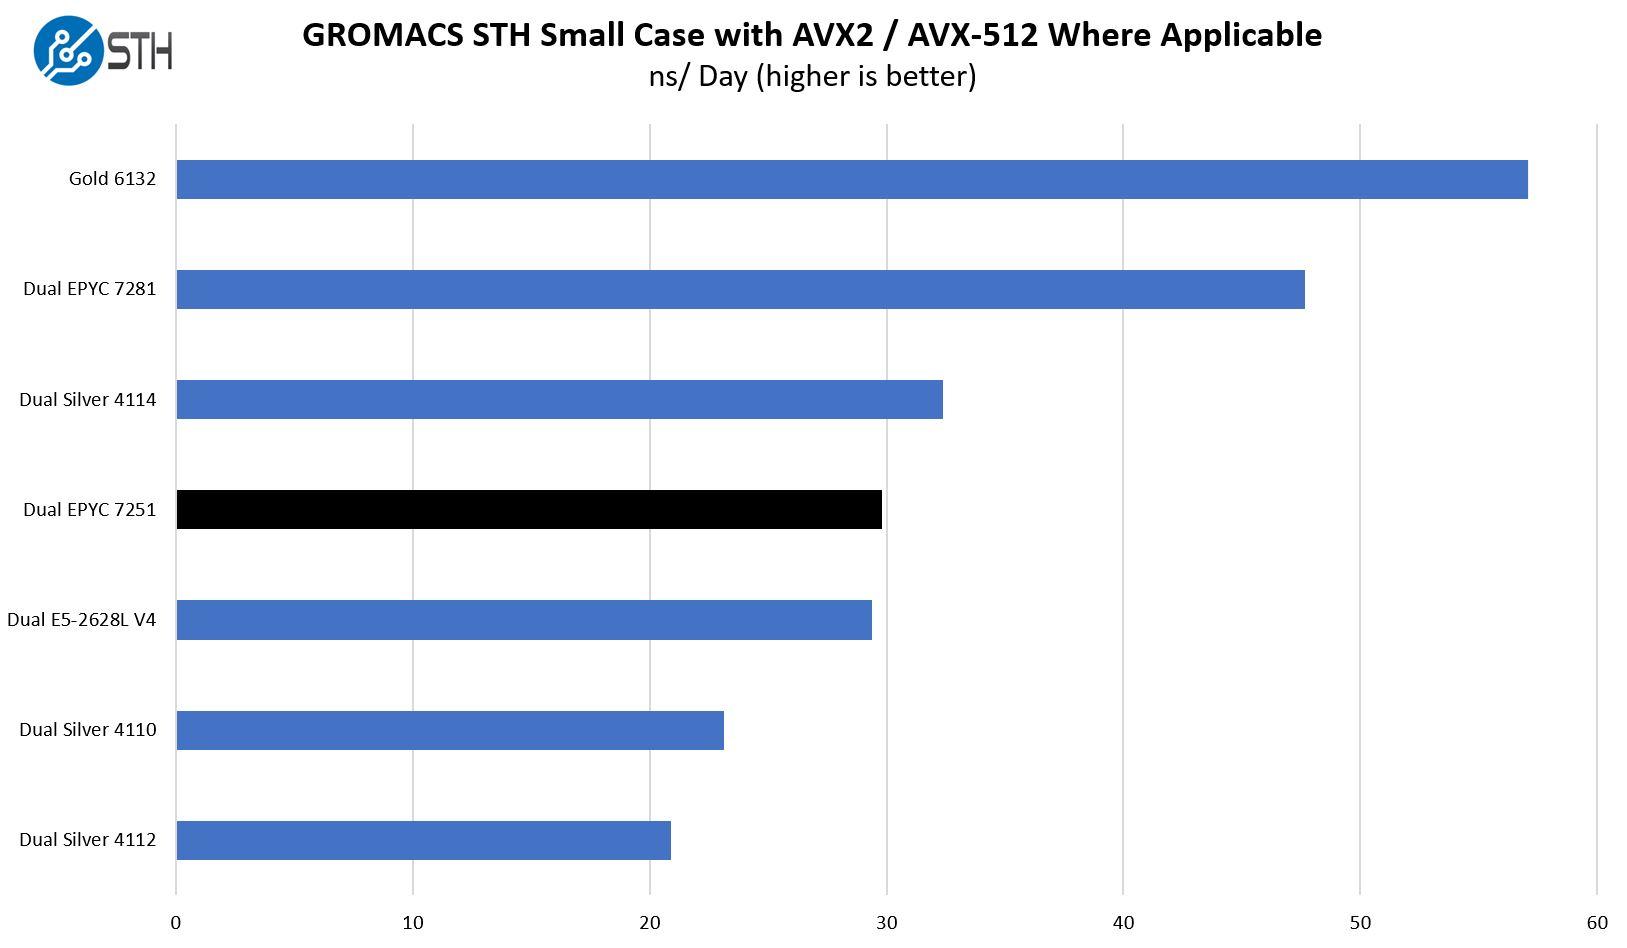 Dual-AMD-EPYC-7251-GROMACS-Small.jpg